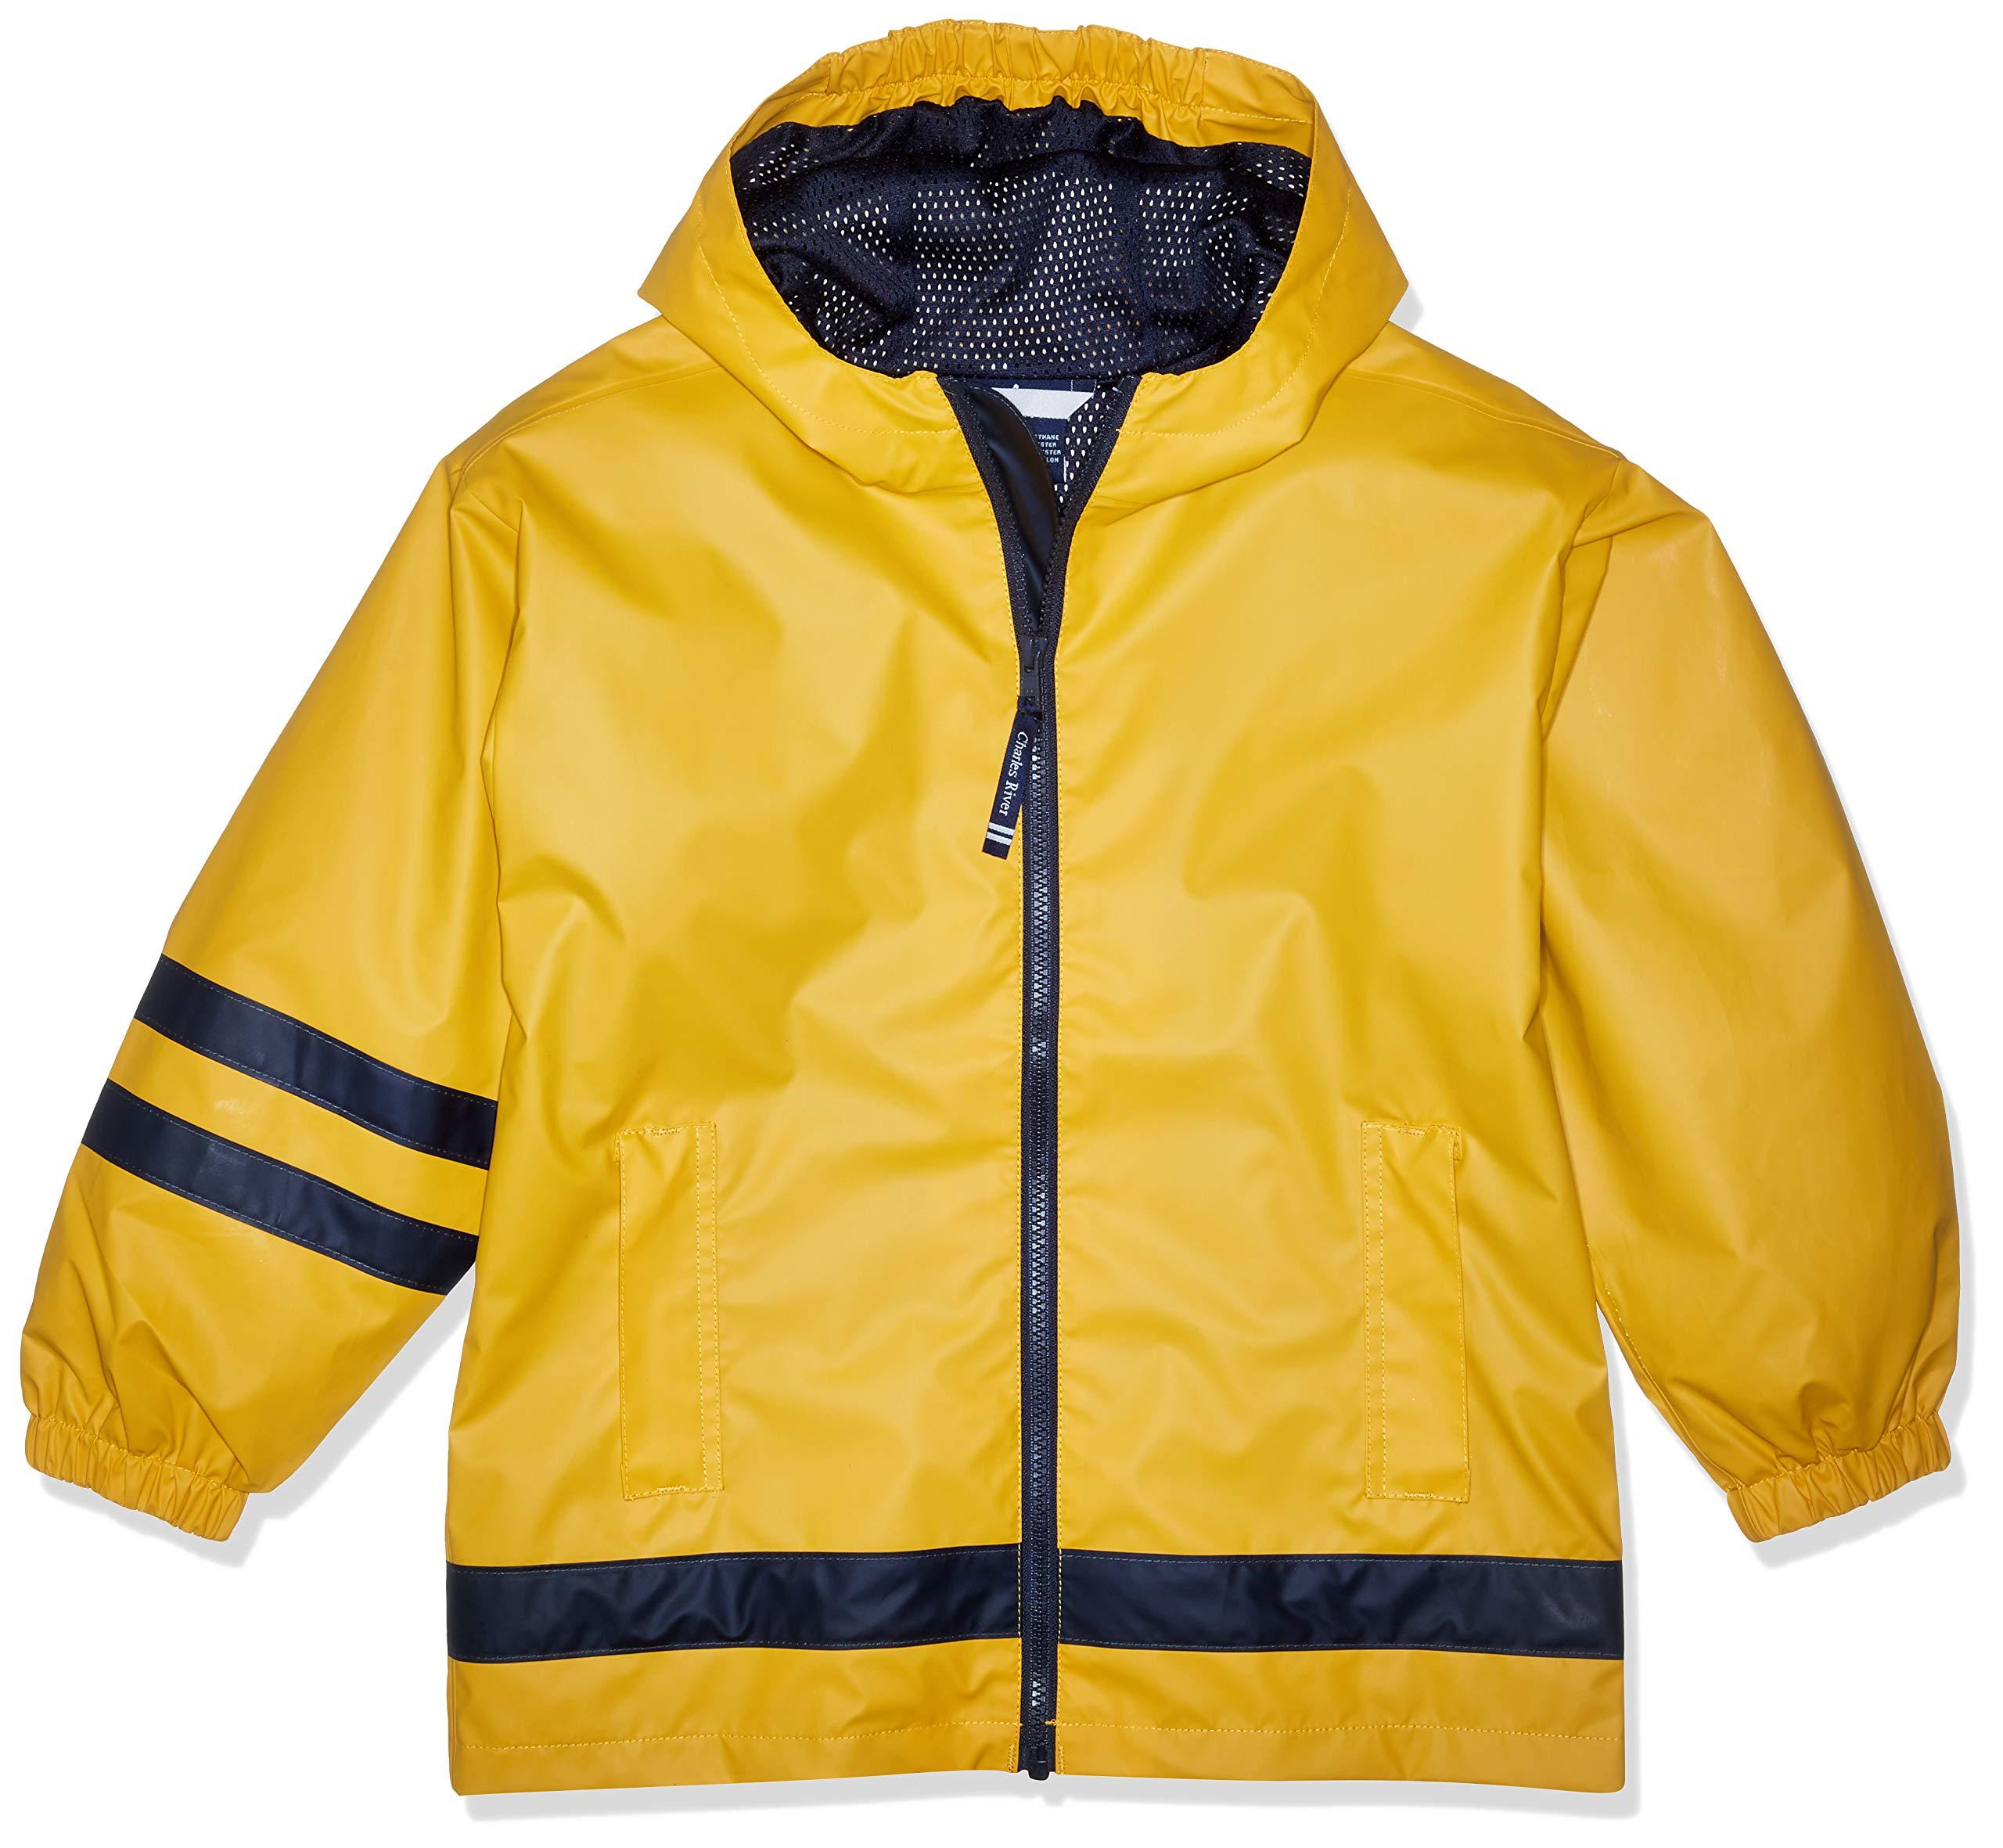 Charles River Apparel Kids' Big New Englander Rain Jacket, Yellow, L by Charles River Apparel